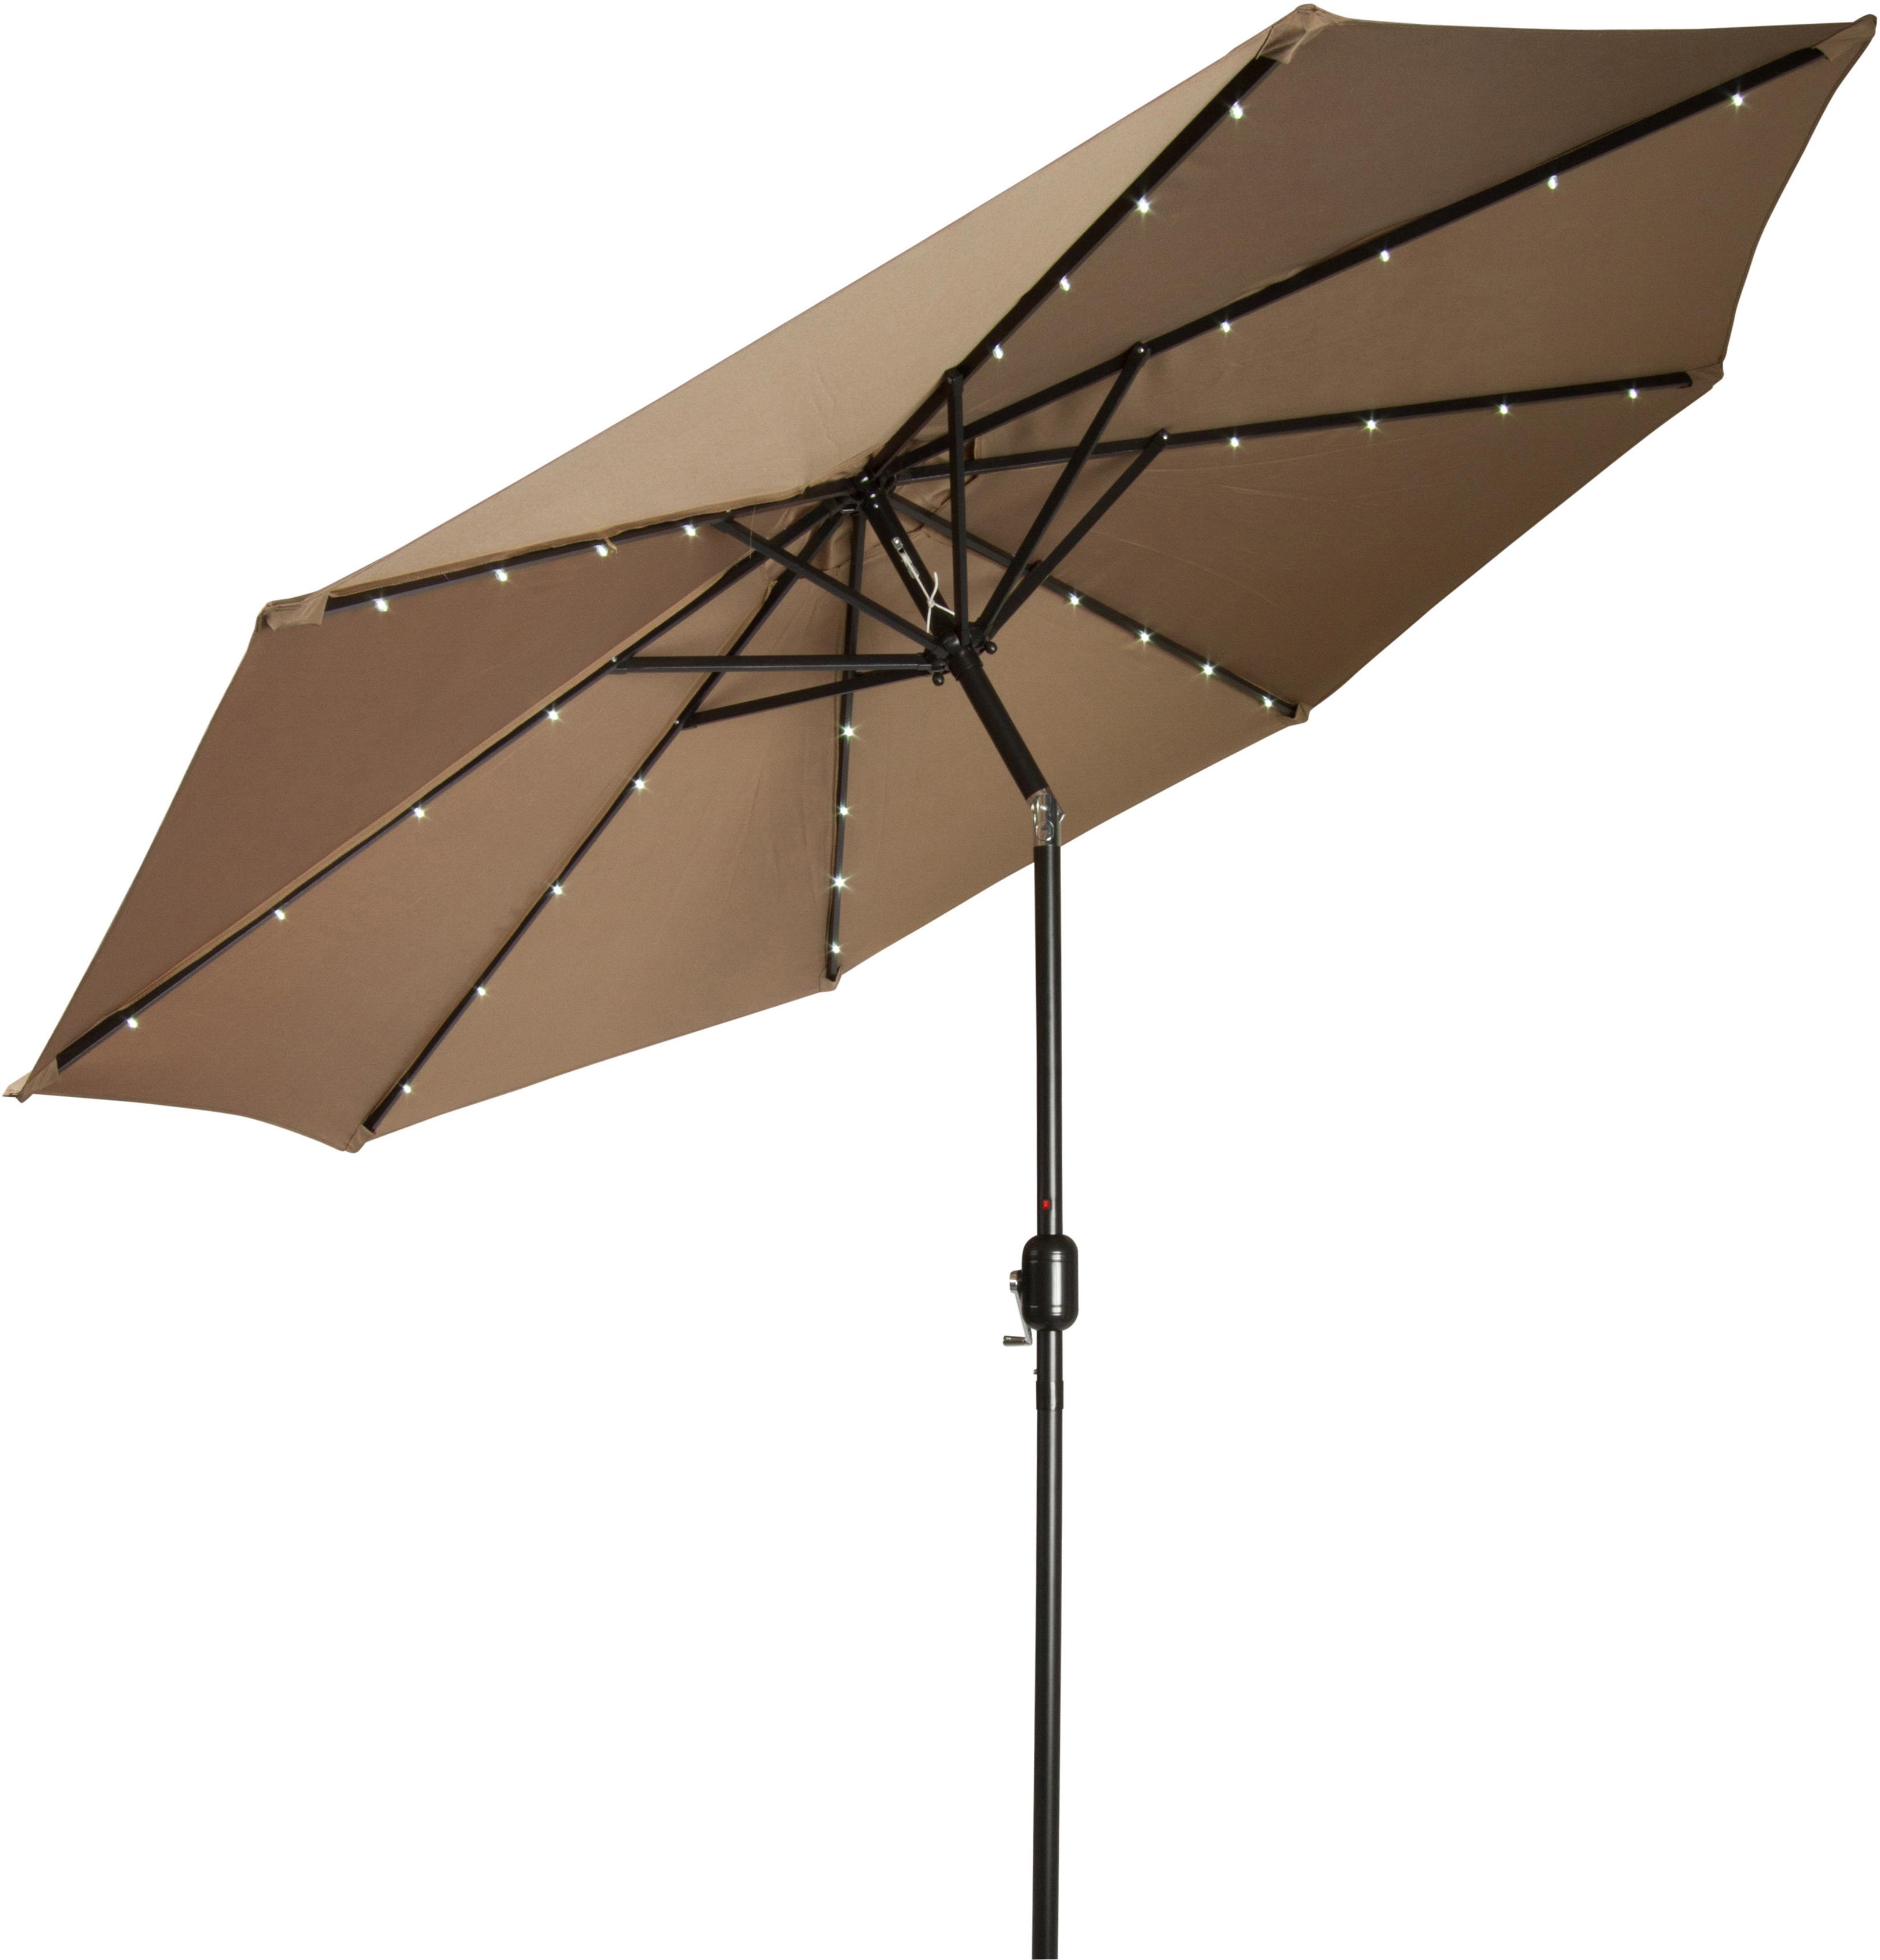 Mcdougal Market Umbrellas Within Most Popular Woll 9' Lighted Market Umbrella (Gallery 18 of 20)